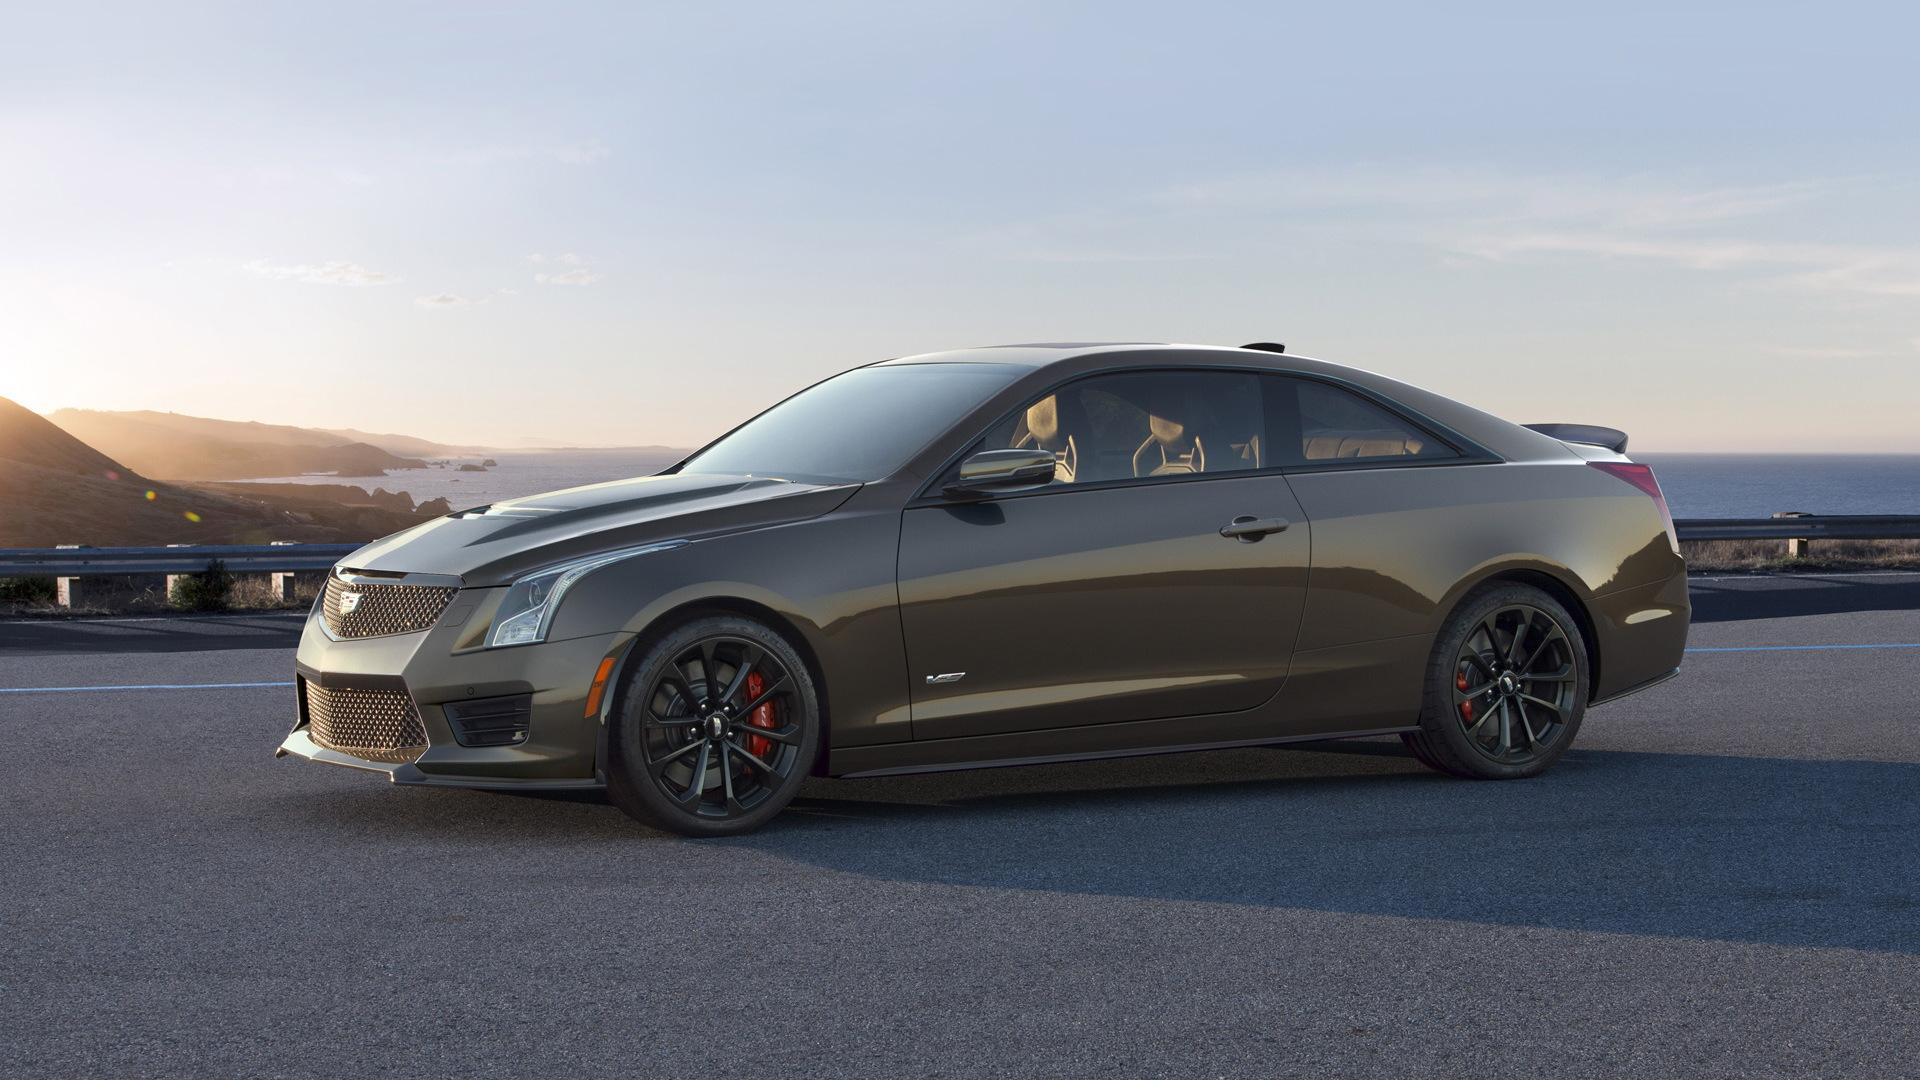 2020 Cadillac Ats V Coupe Review